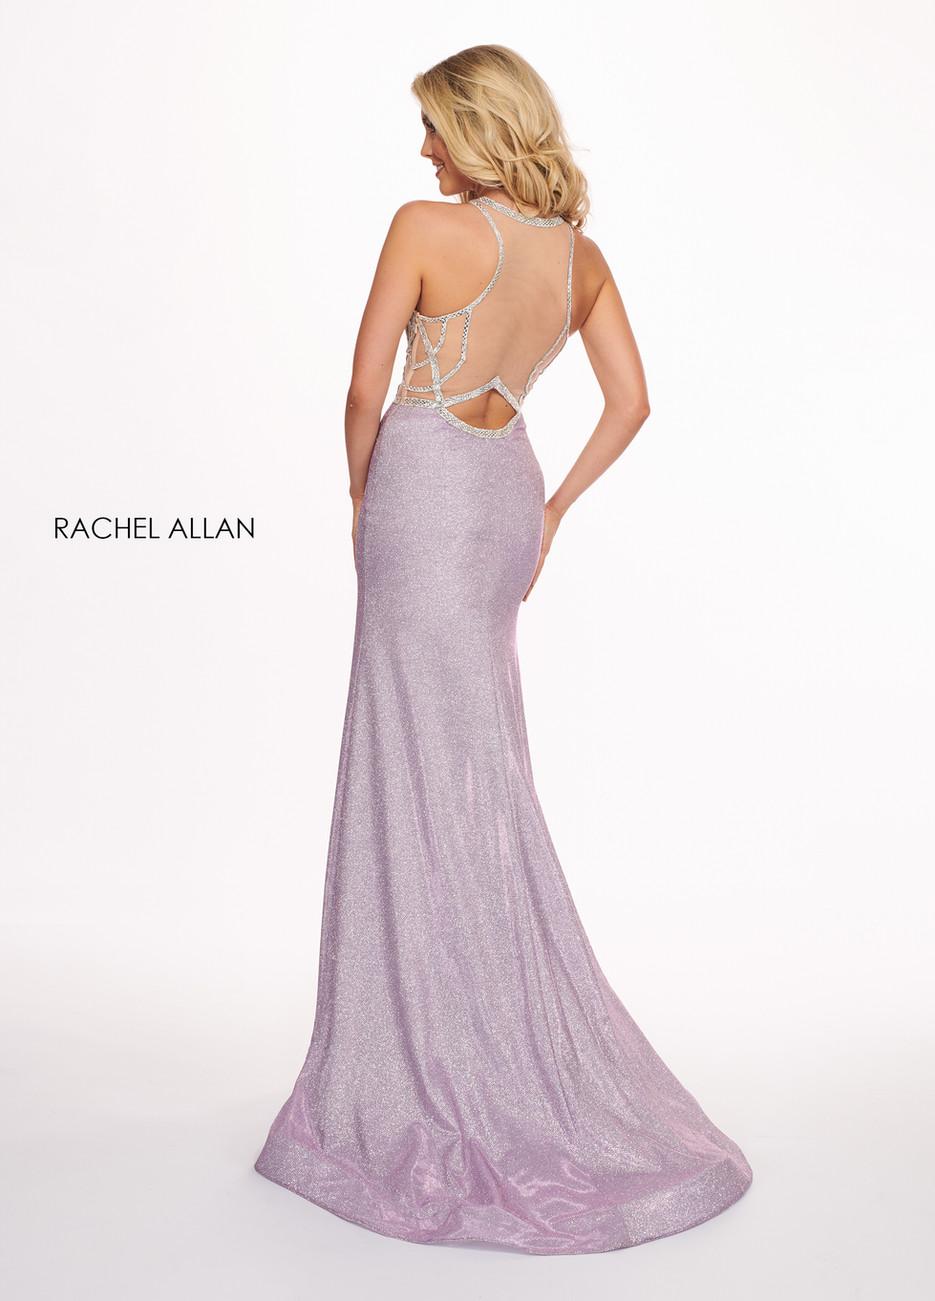 Rachel Allan Prom Style 6491